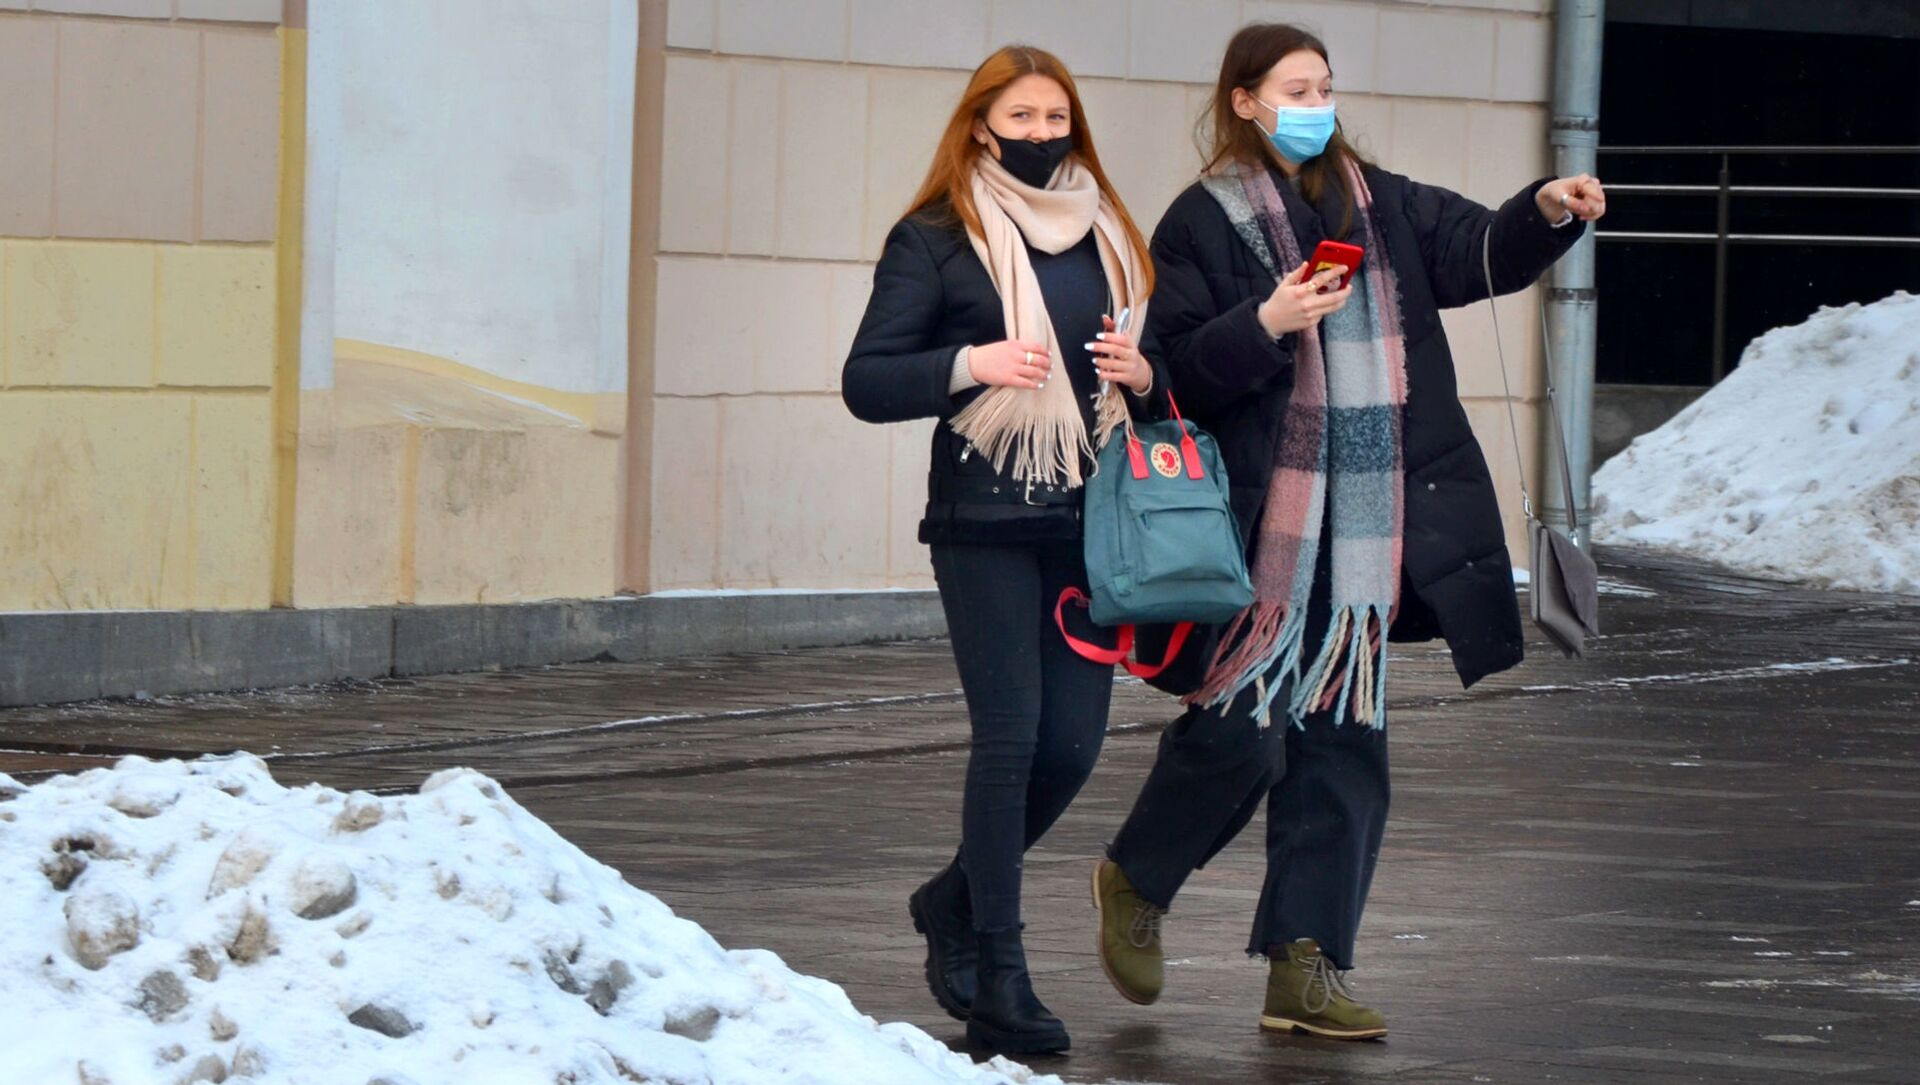 Coronavirus in Russia - gennaio 2021 - Sputnik Italia, 1920, 25.02.2021